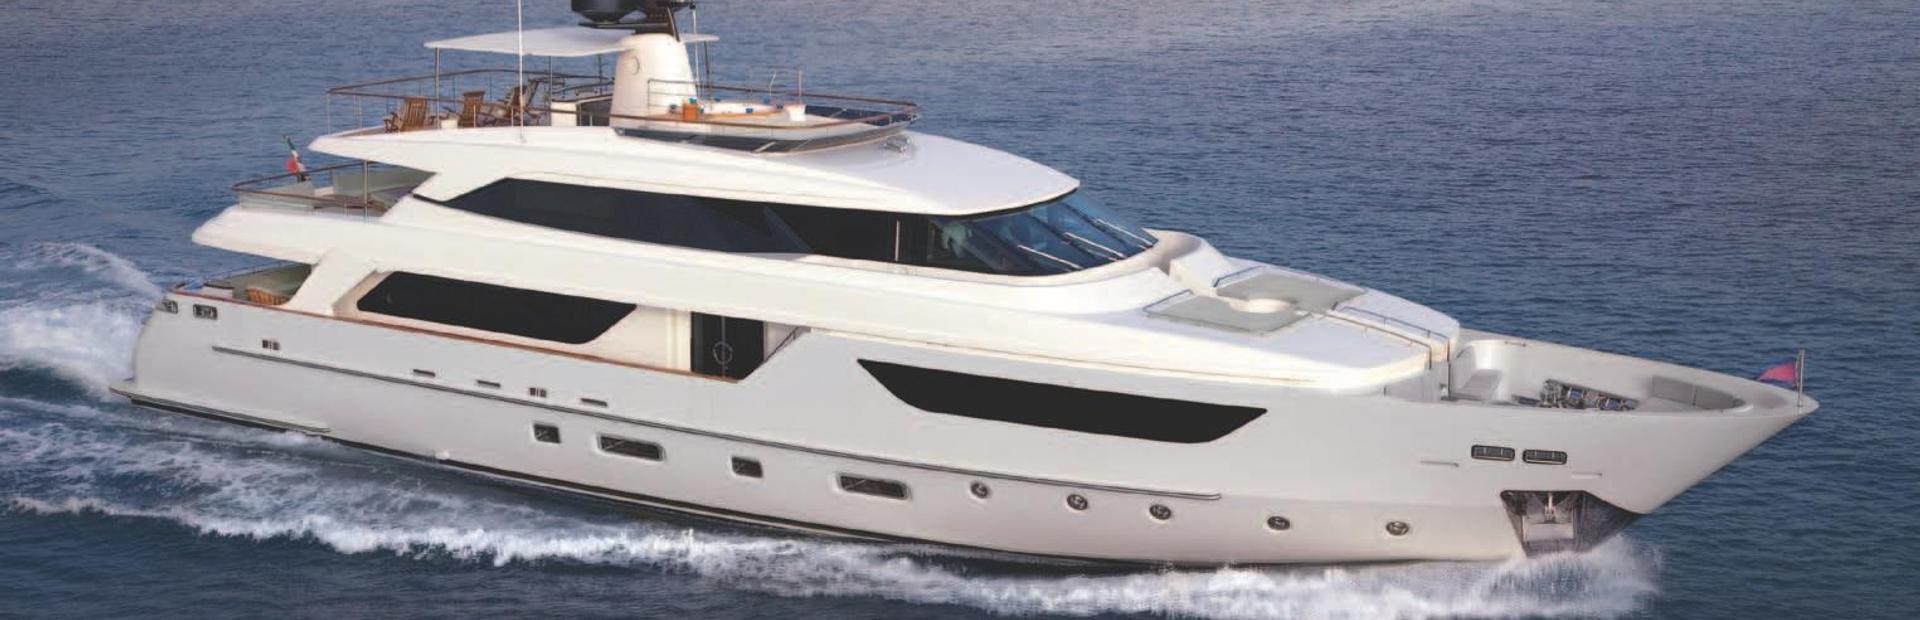 SD122 Yacht Charter